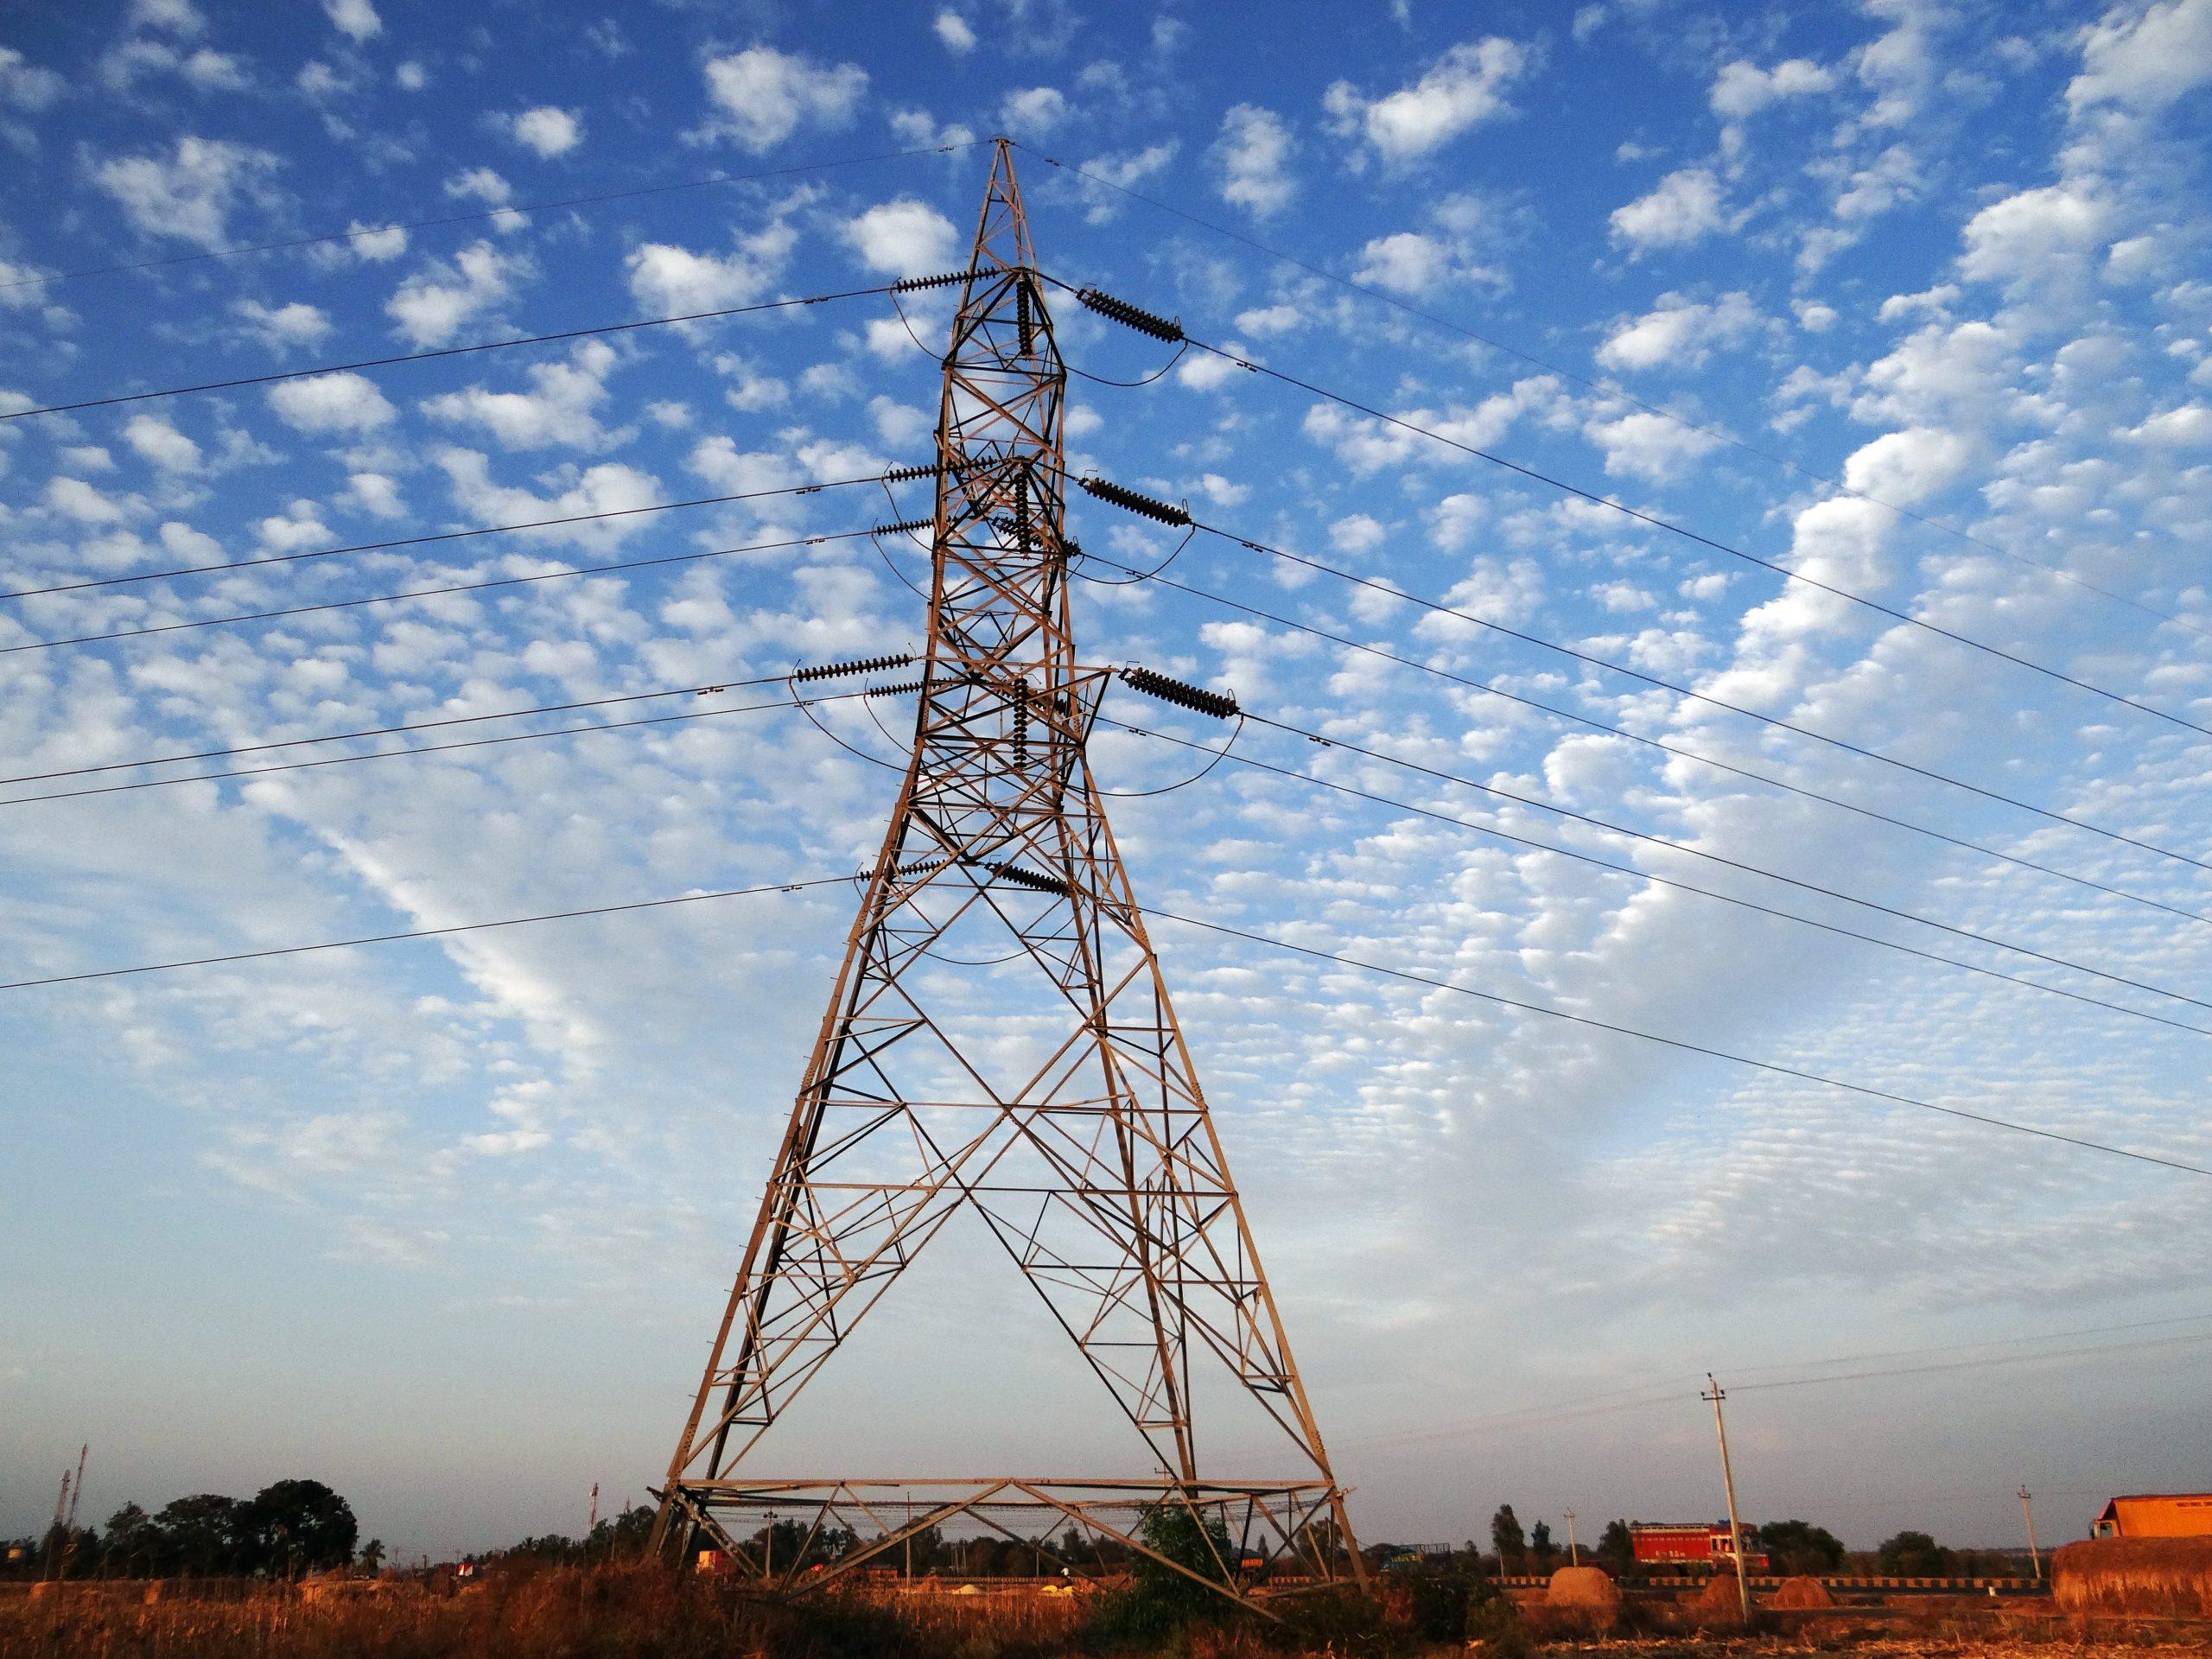 sky-windmill-wind-tower-mast-electricity-1108826-pxhere.com